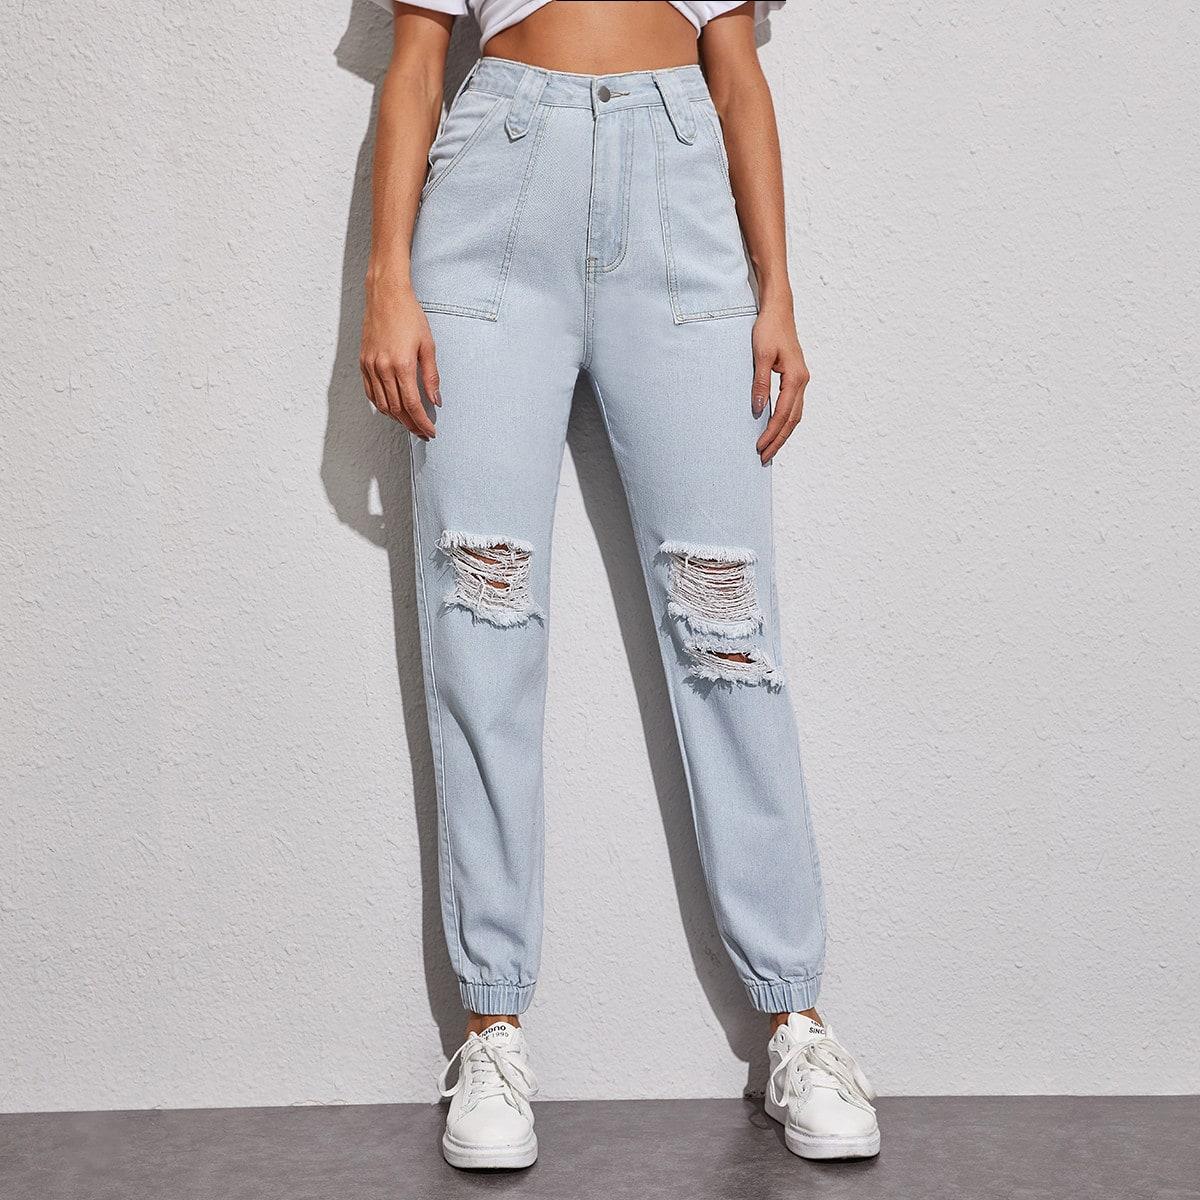 shein Blauw Casual Vlak jeans Knoop